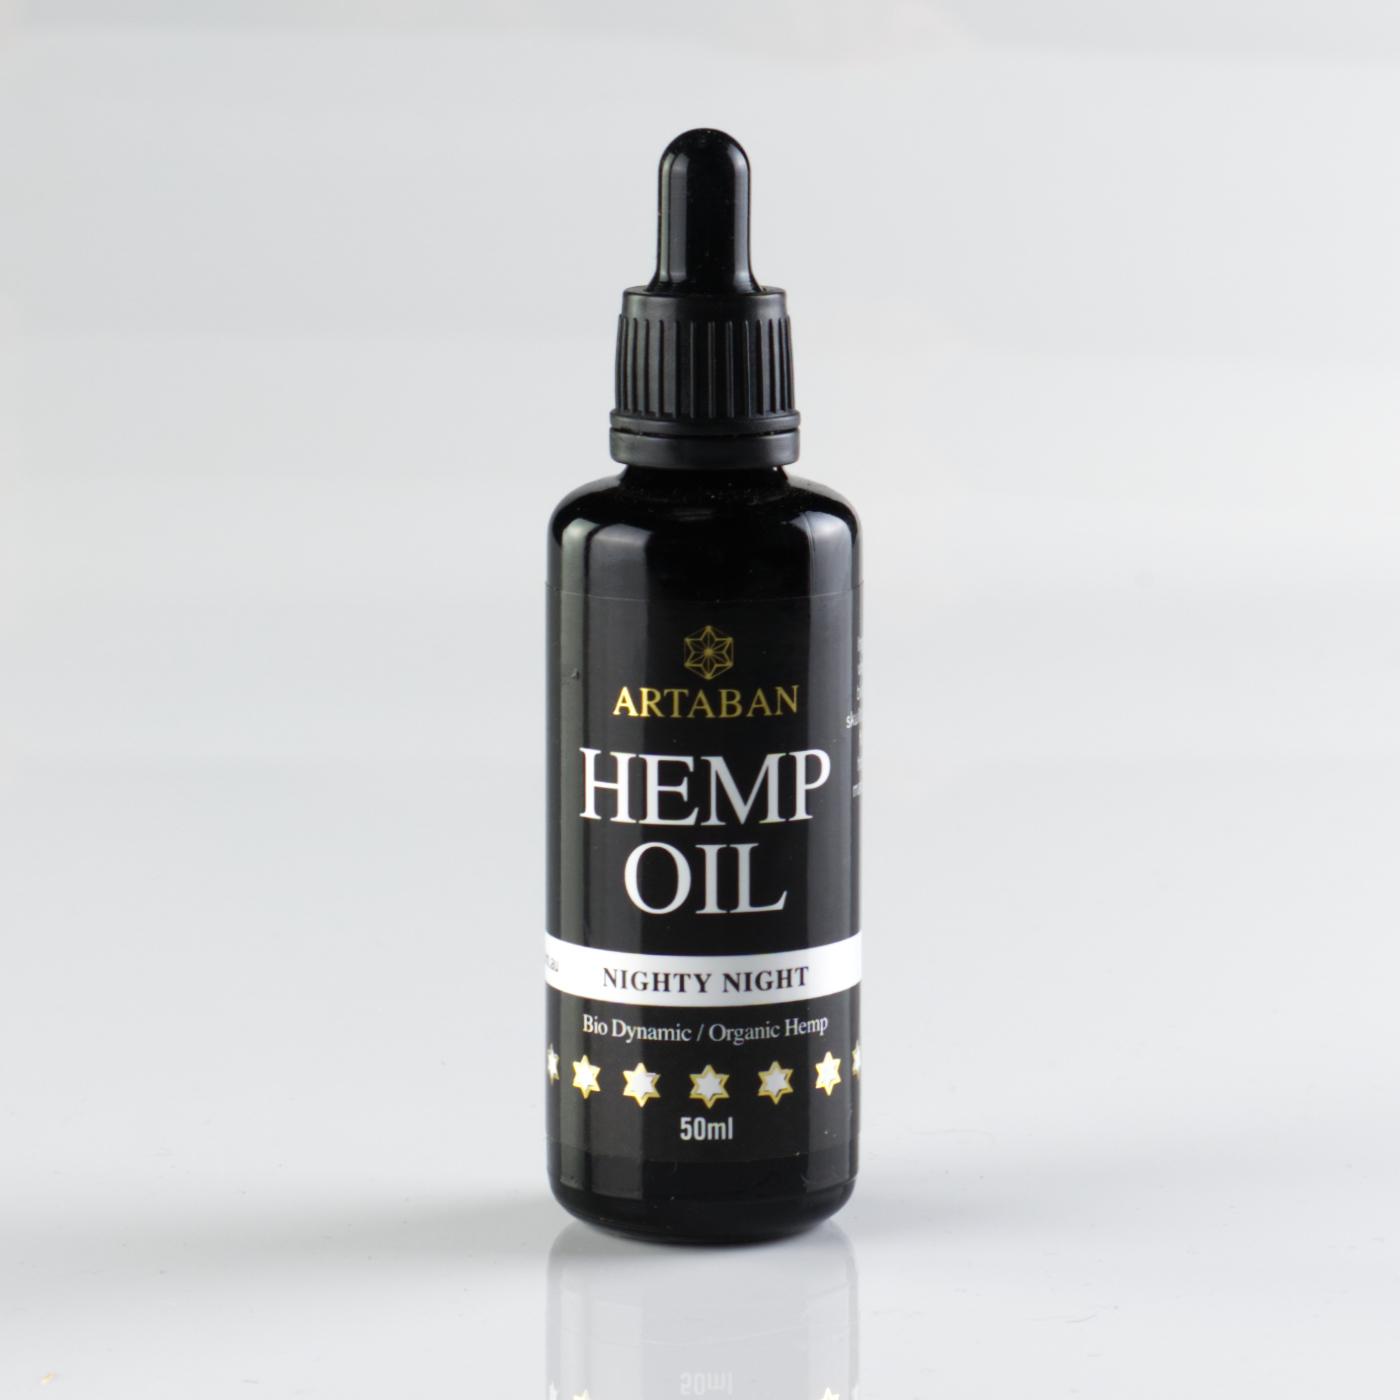 Nighty Night Hemp Oil